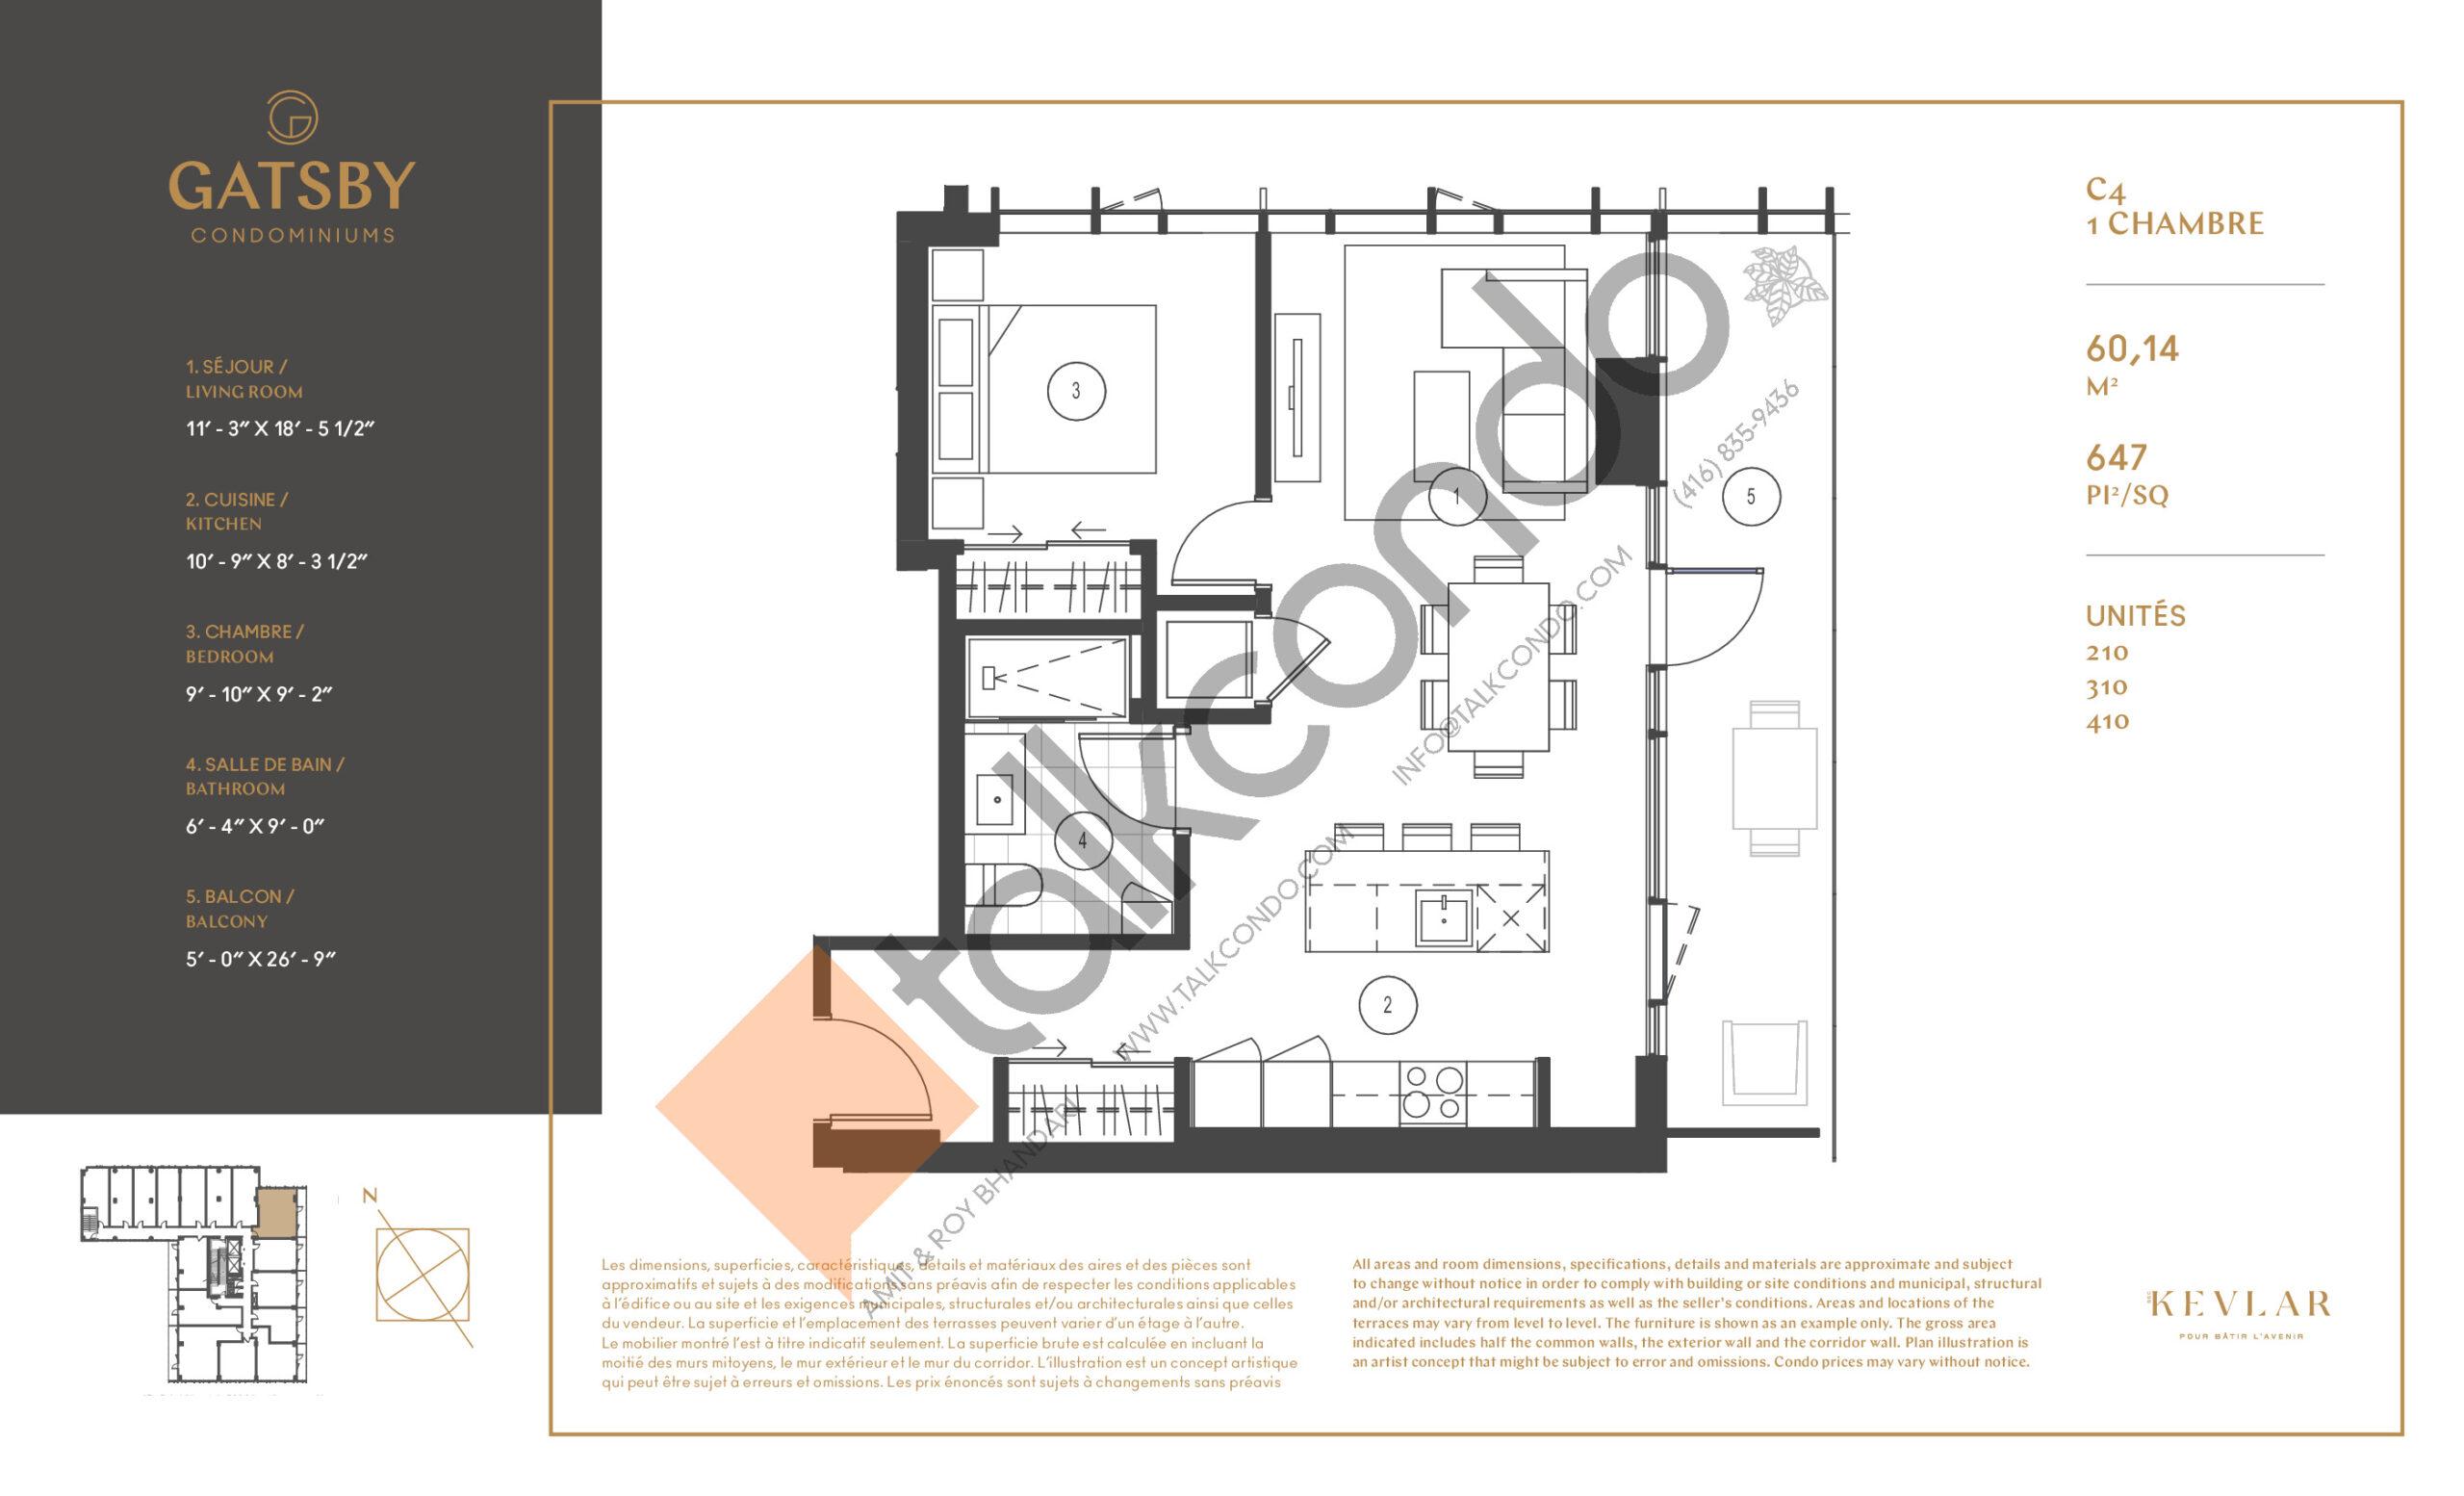 C4 Floor Plan at Gatsby Condos - 647 sq.ft